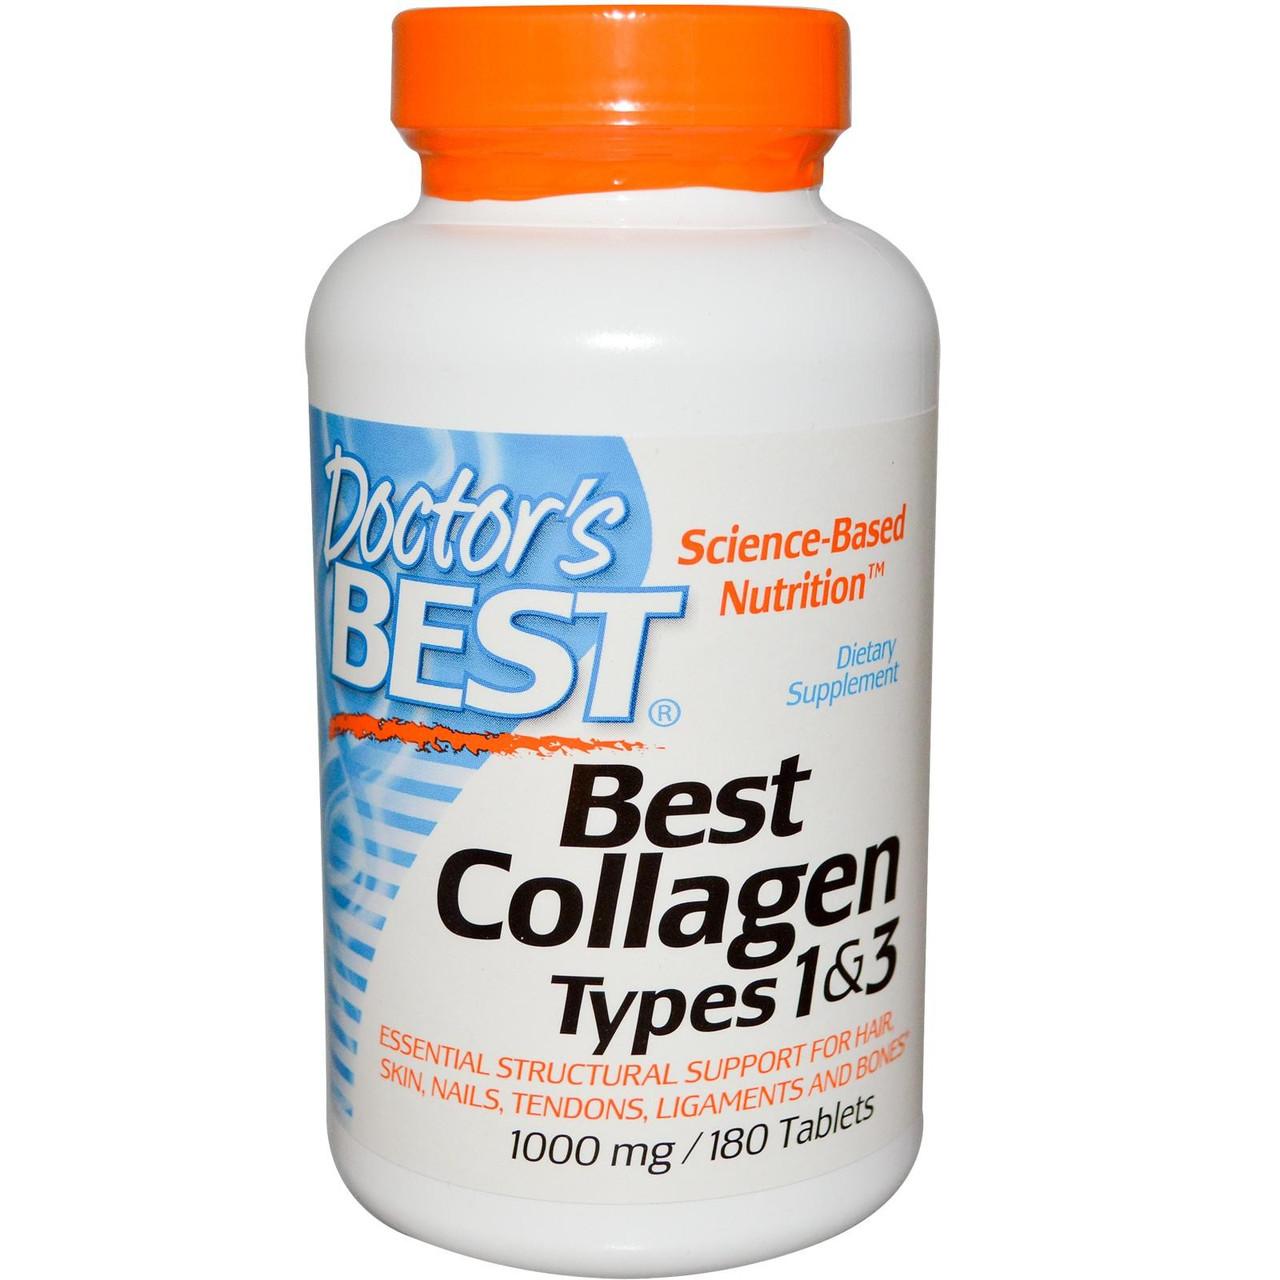 Коллаген 1 и 3 типа Best Collagen Types 1&3 (180 табл.) Doctor's Best